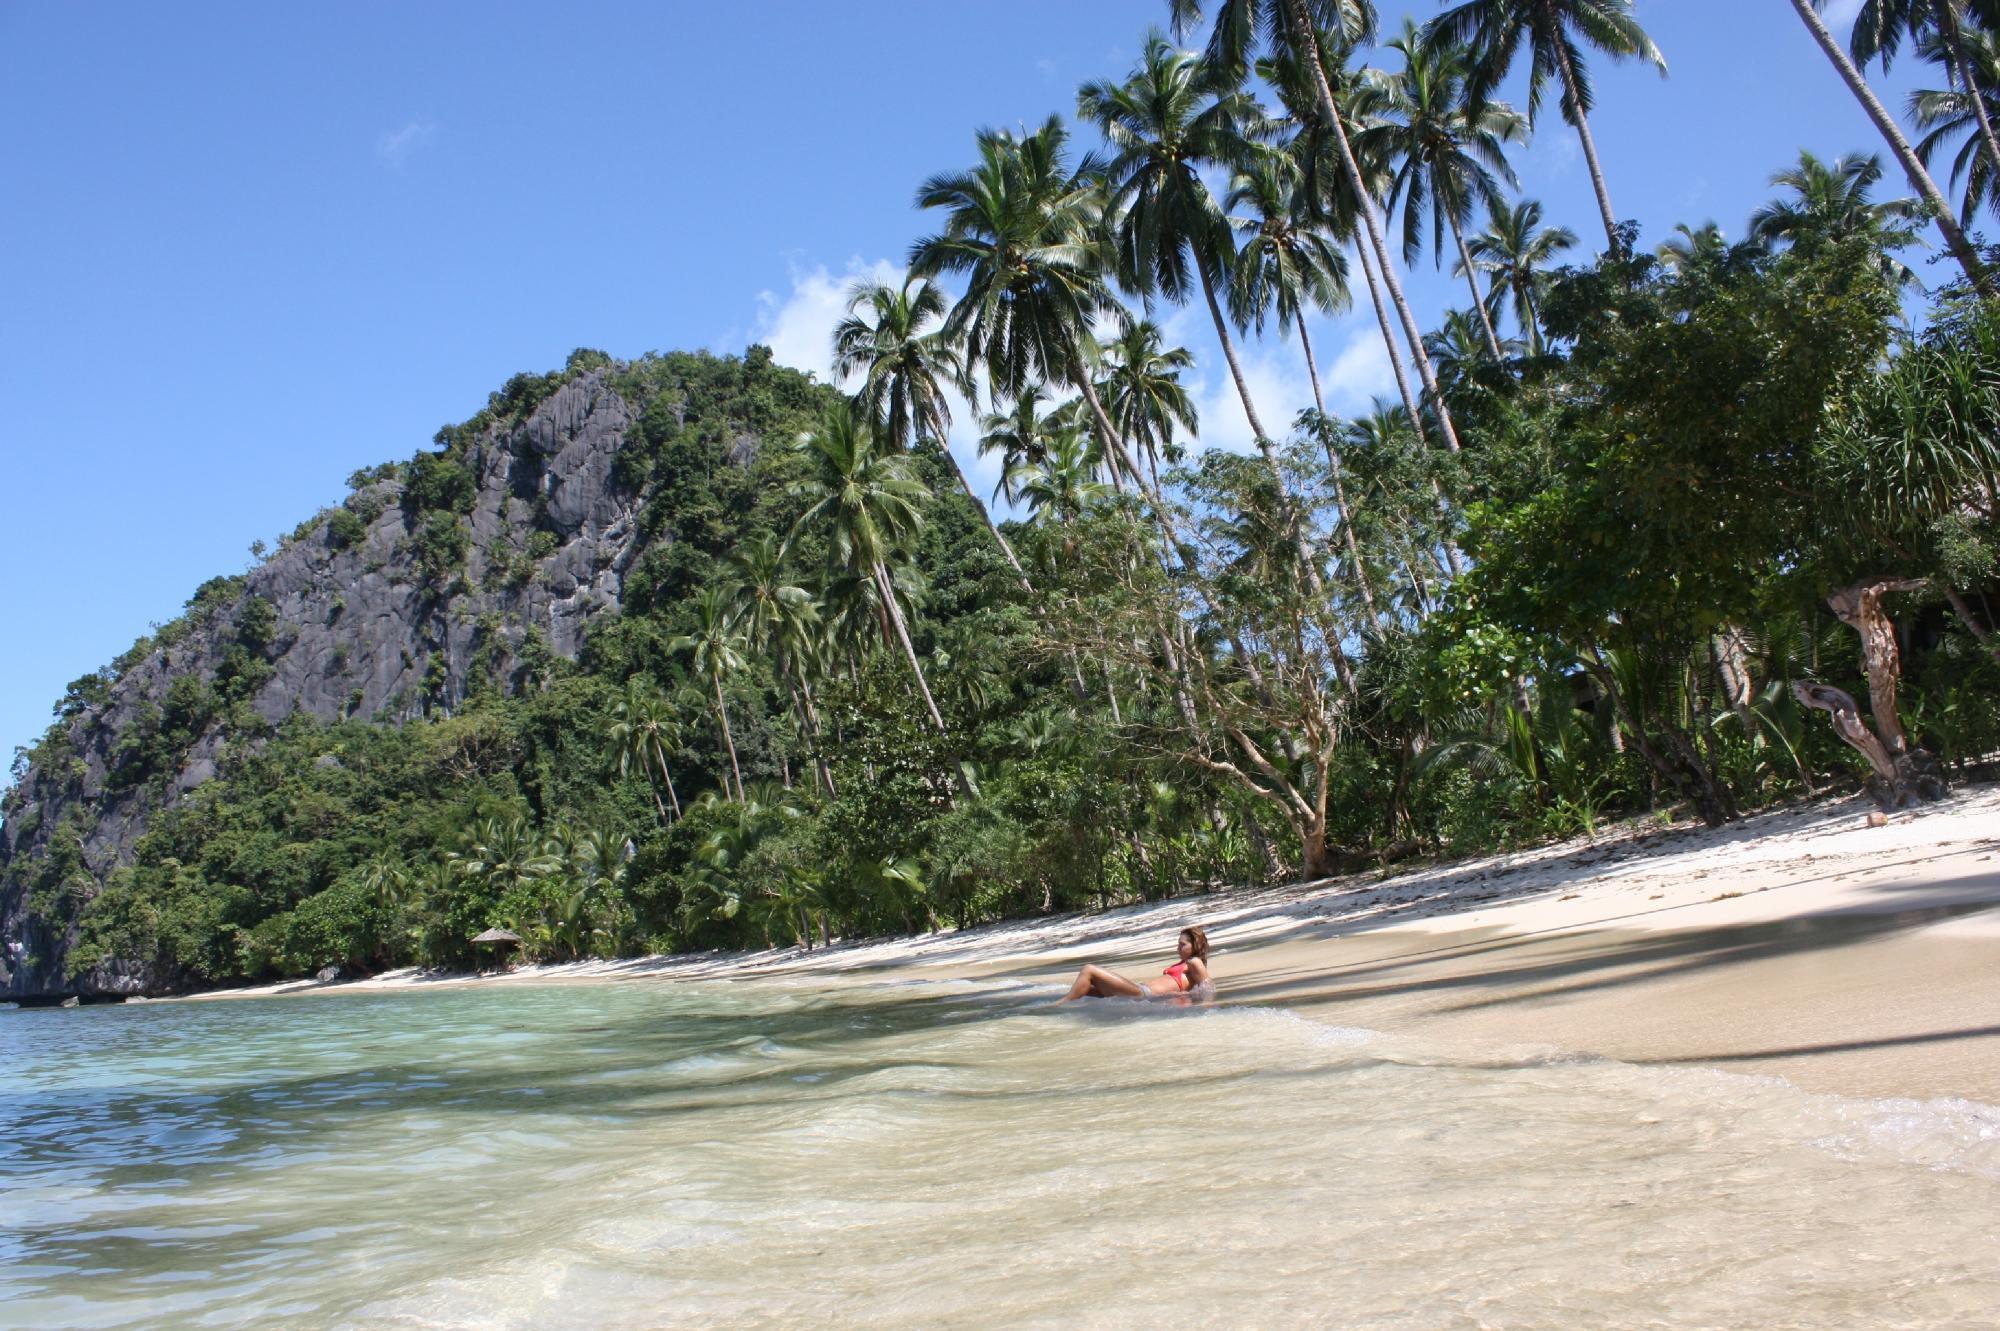 Malapacao Private Island